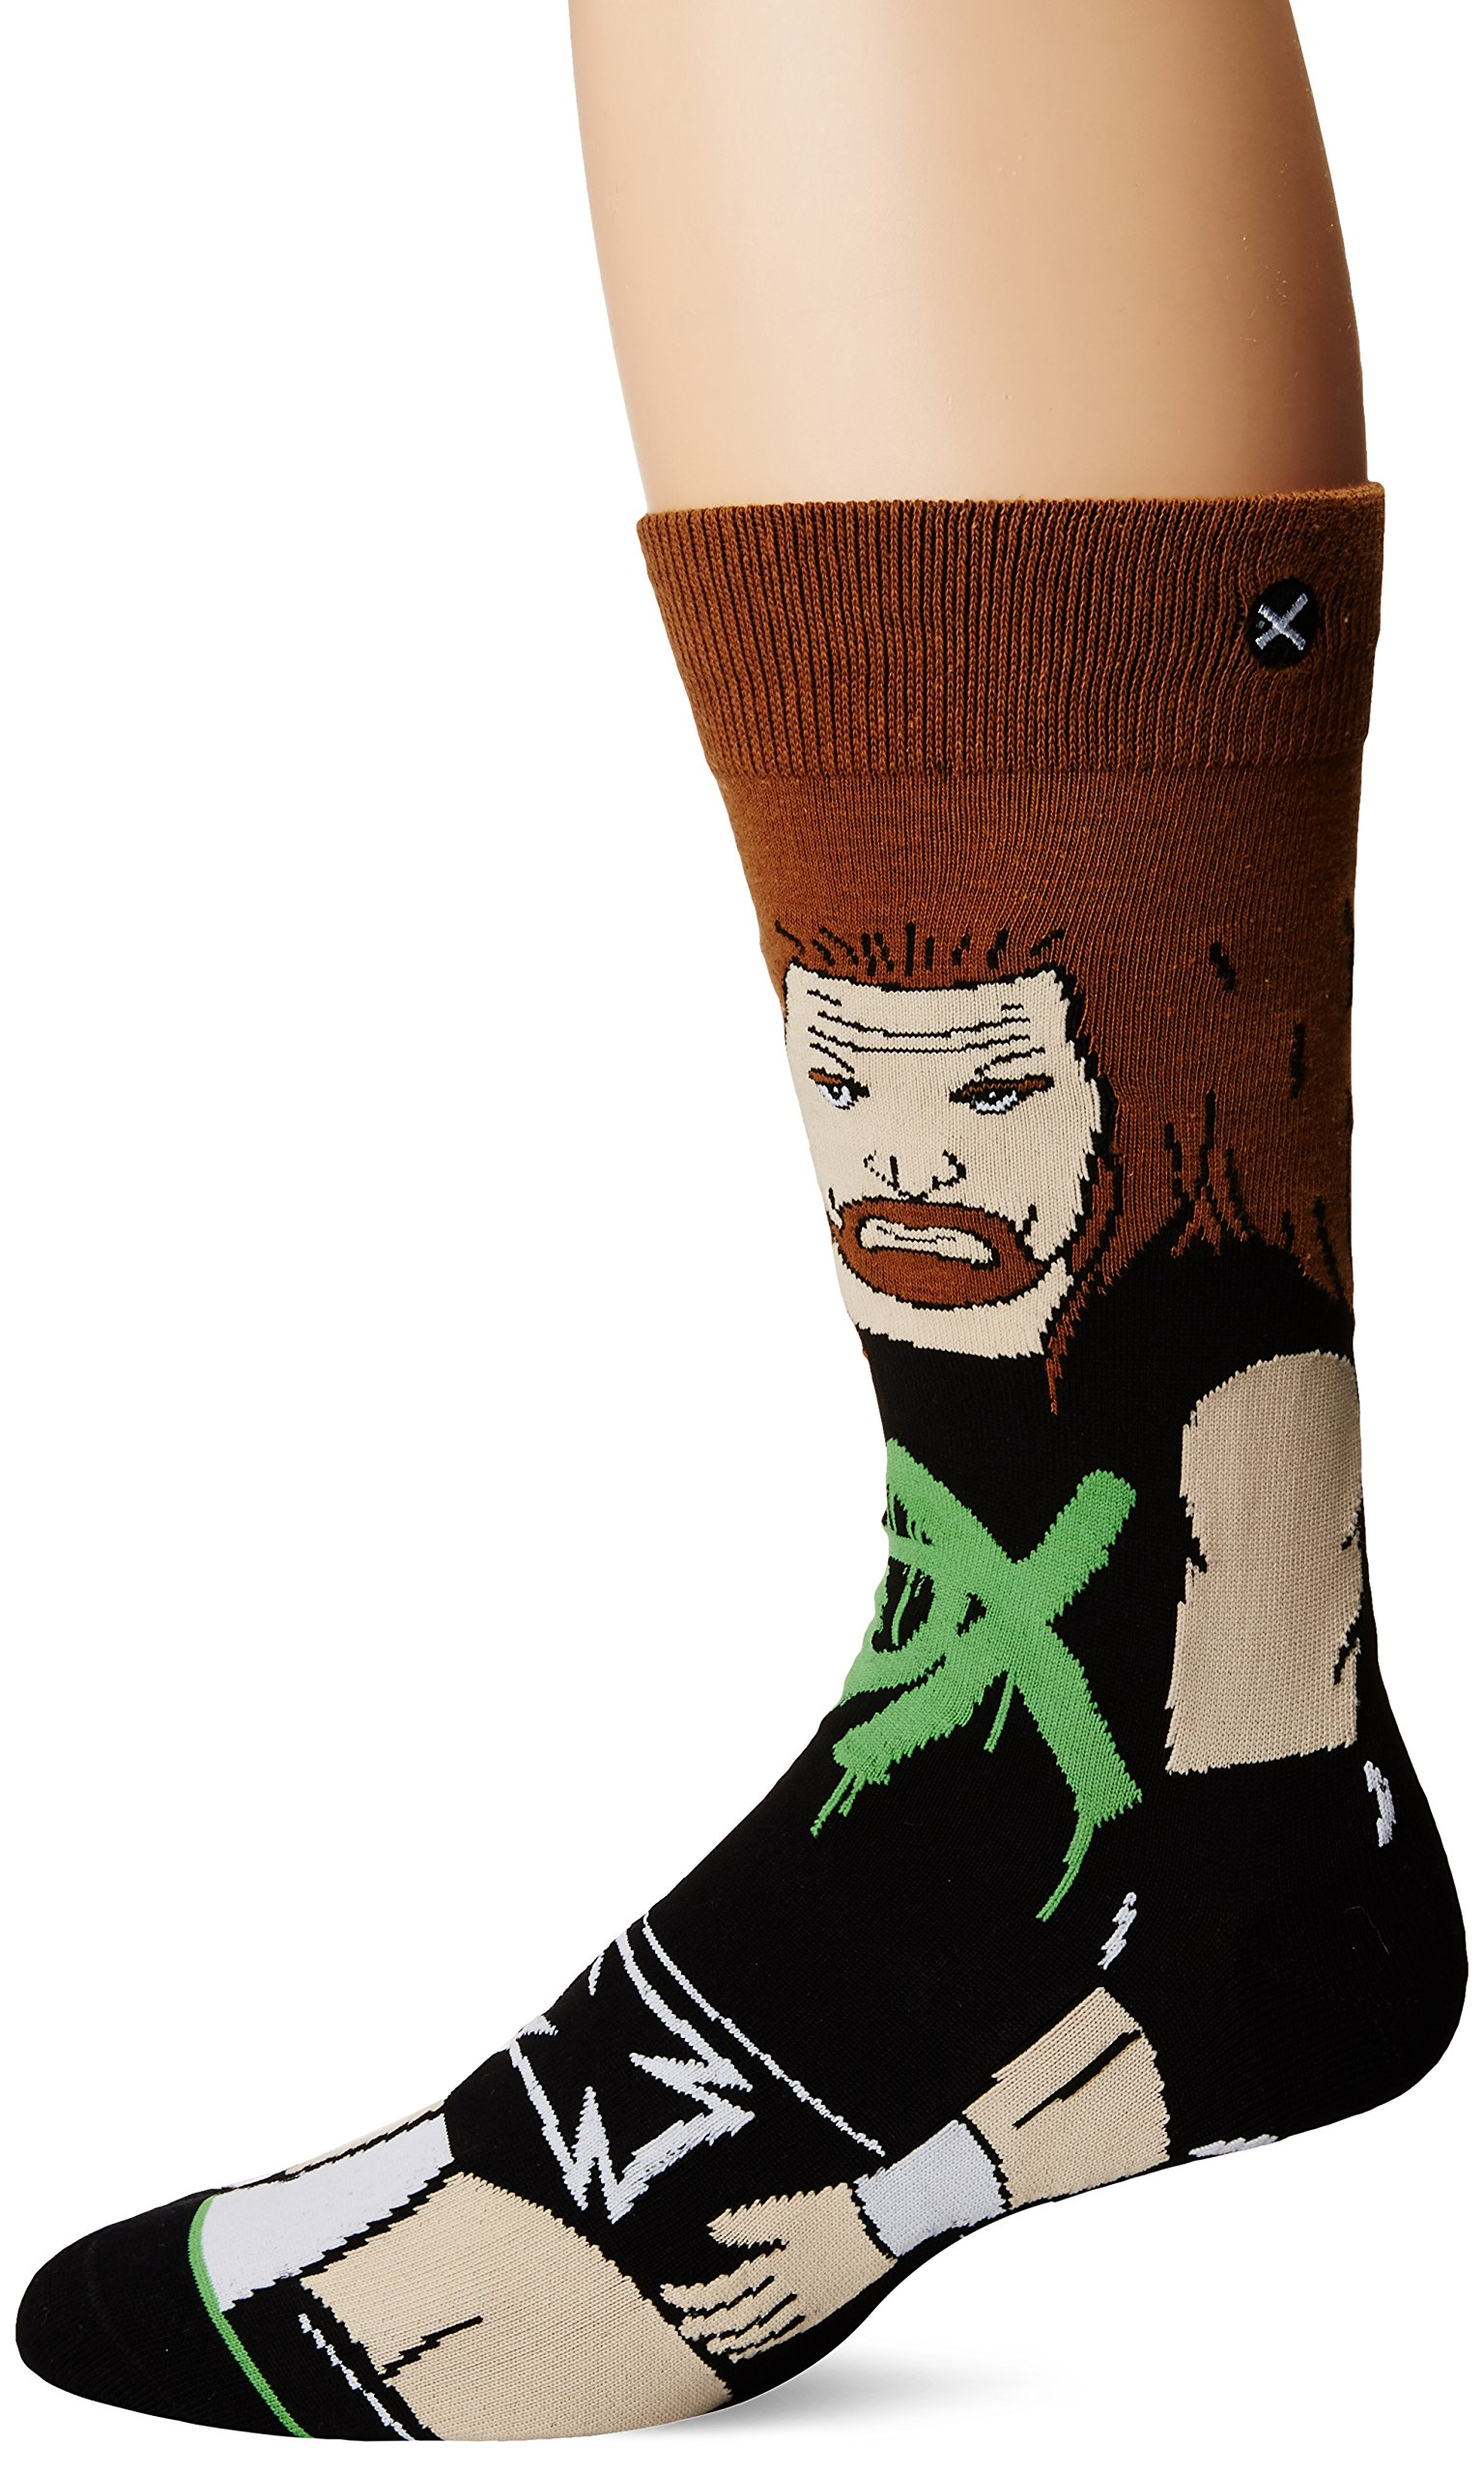 Odd Sox Men's Degeneration X (360 Knit), Multi, Sock Size:10-13/Shoe Size: 6-12